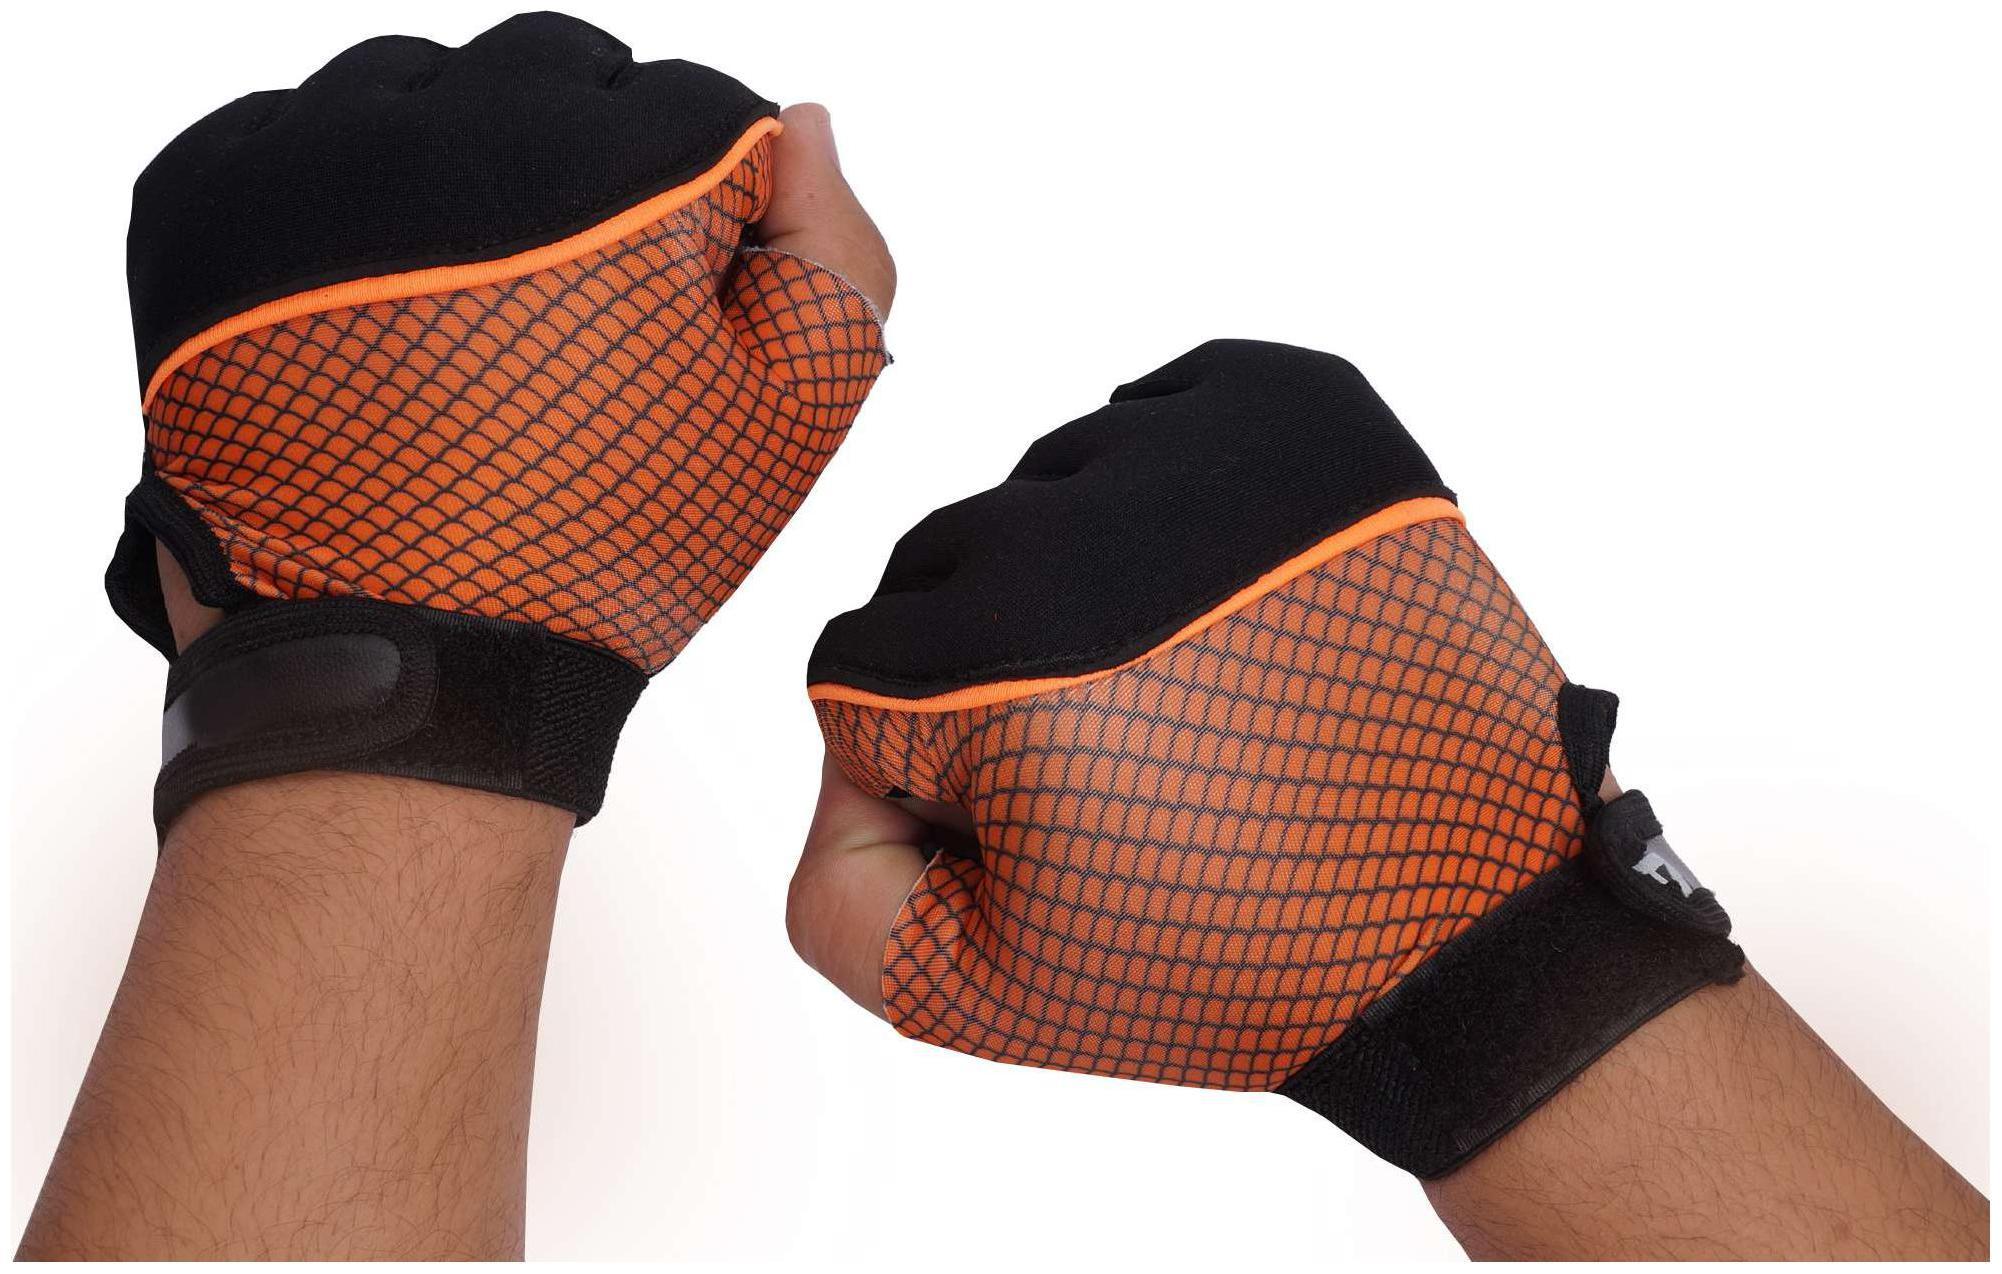 Fashion 7 Vivacious Fitness Gym Gloves